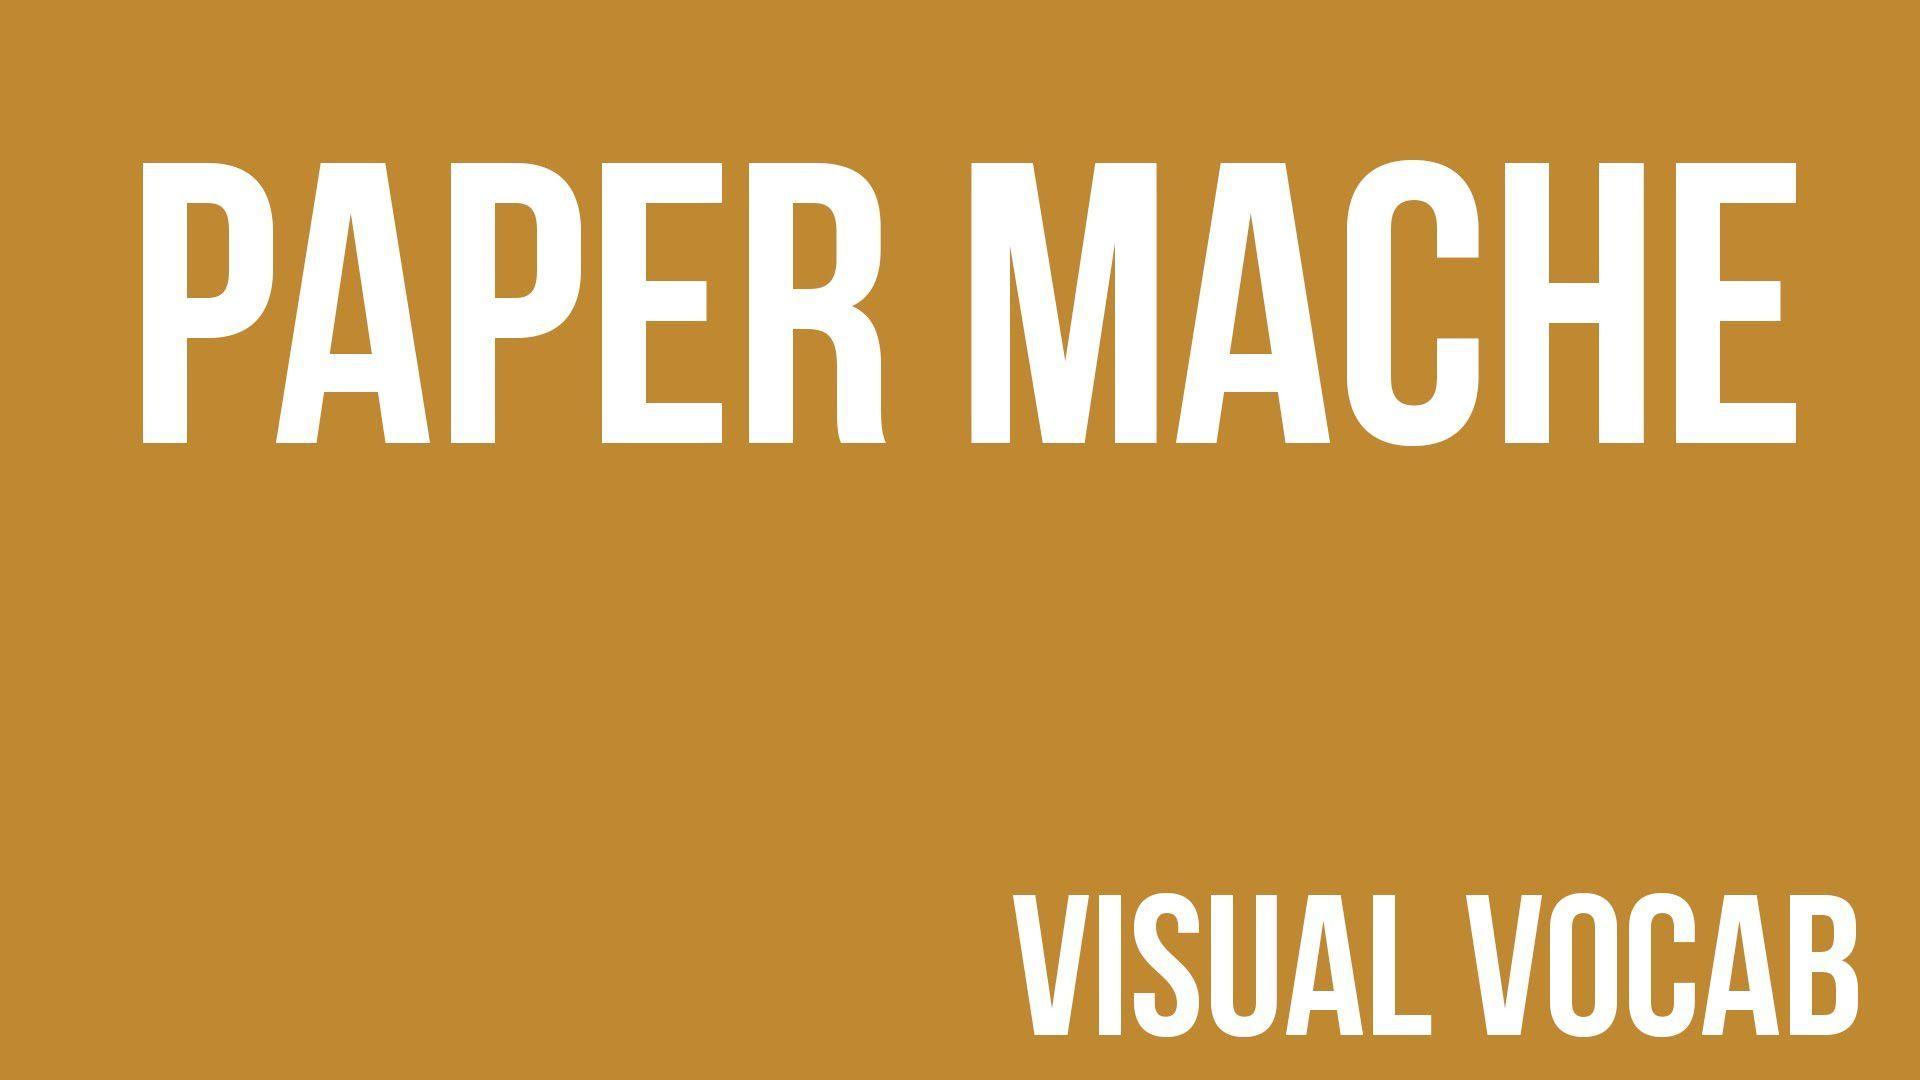 Paper Mache Defined